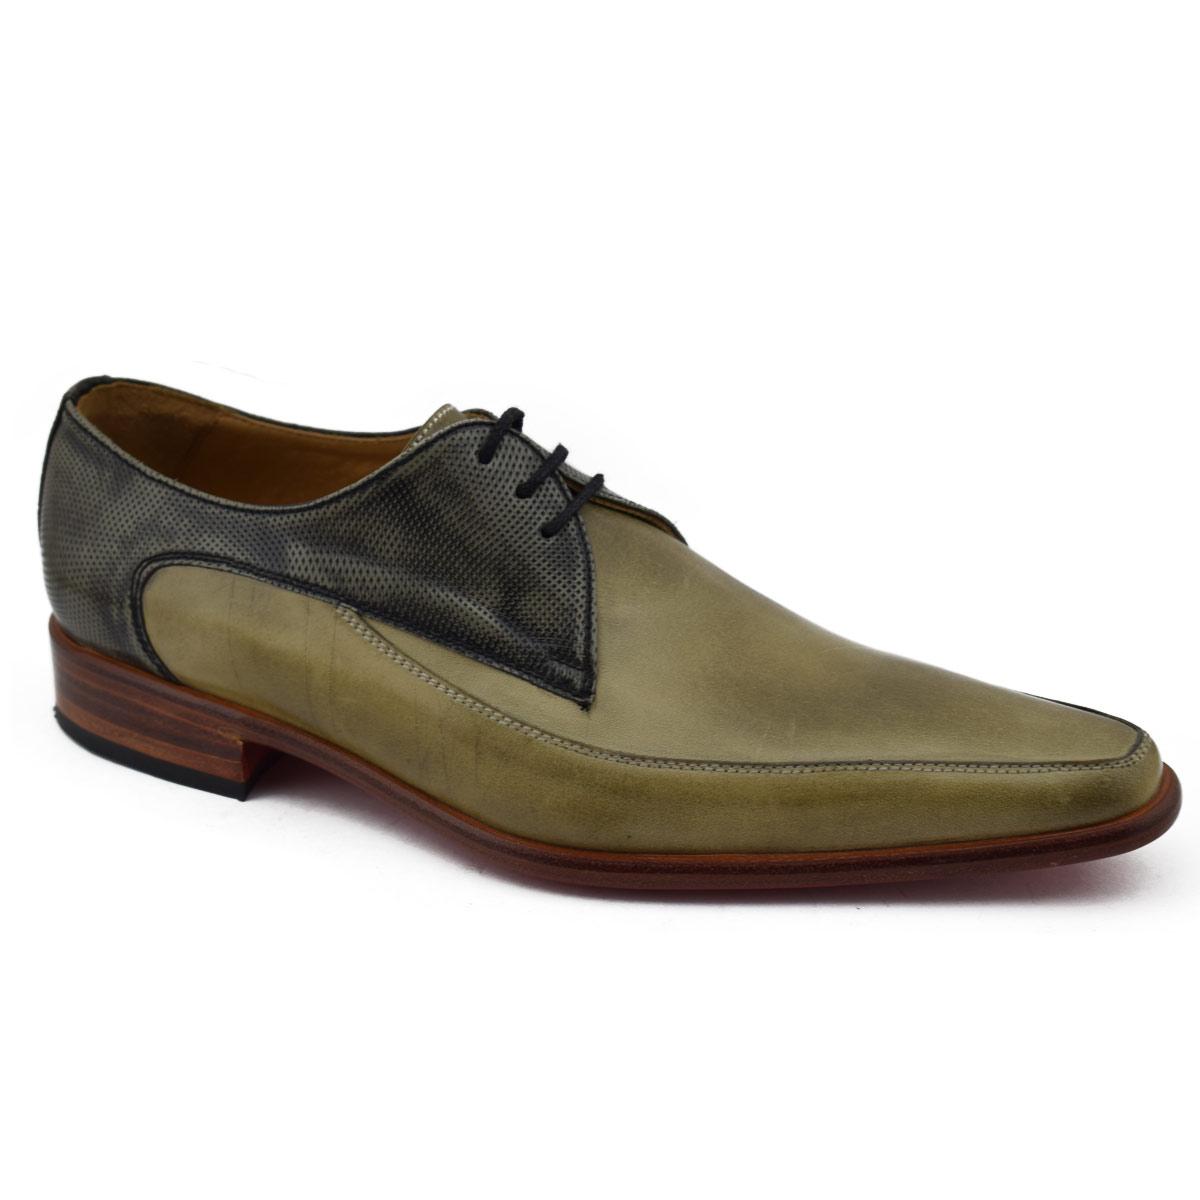 25a9d26f282 zapatos-hombre-ofertas-sale-dino-butelli